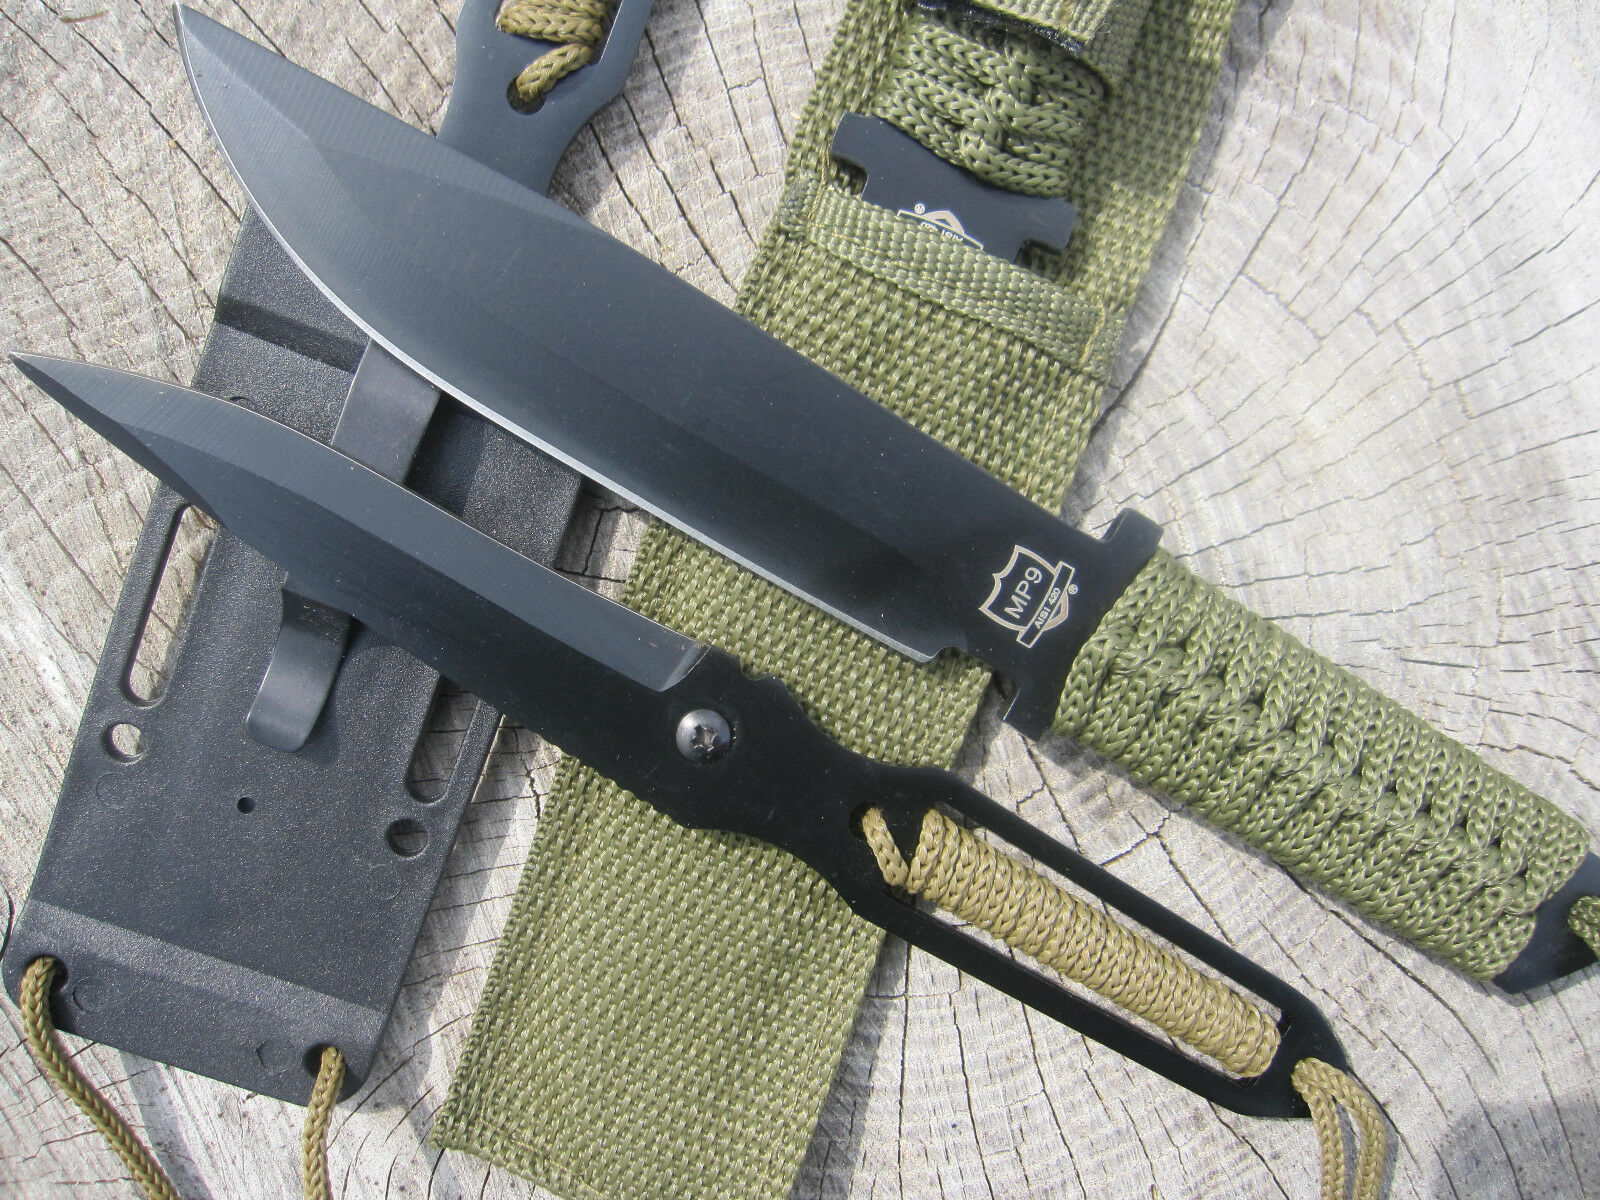 Outdoorset Gürtelmesser + Neck Knife Halsmesser Messer Paracord Edelstahl